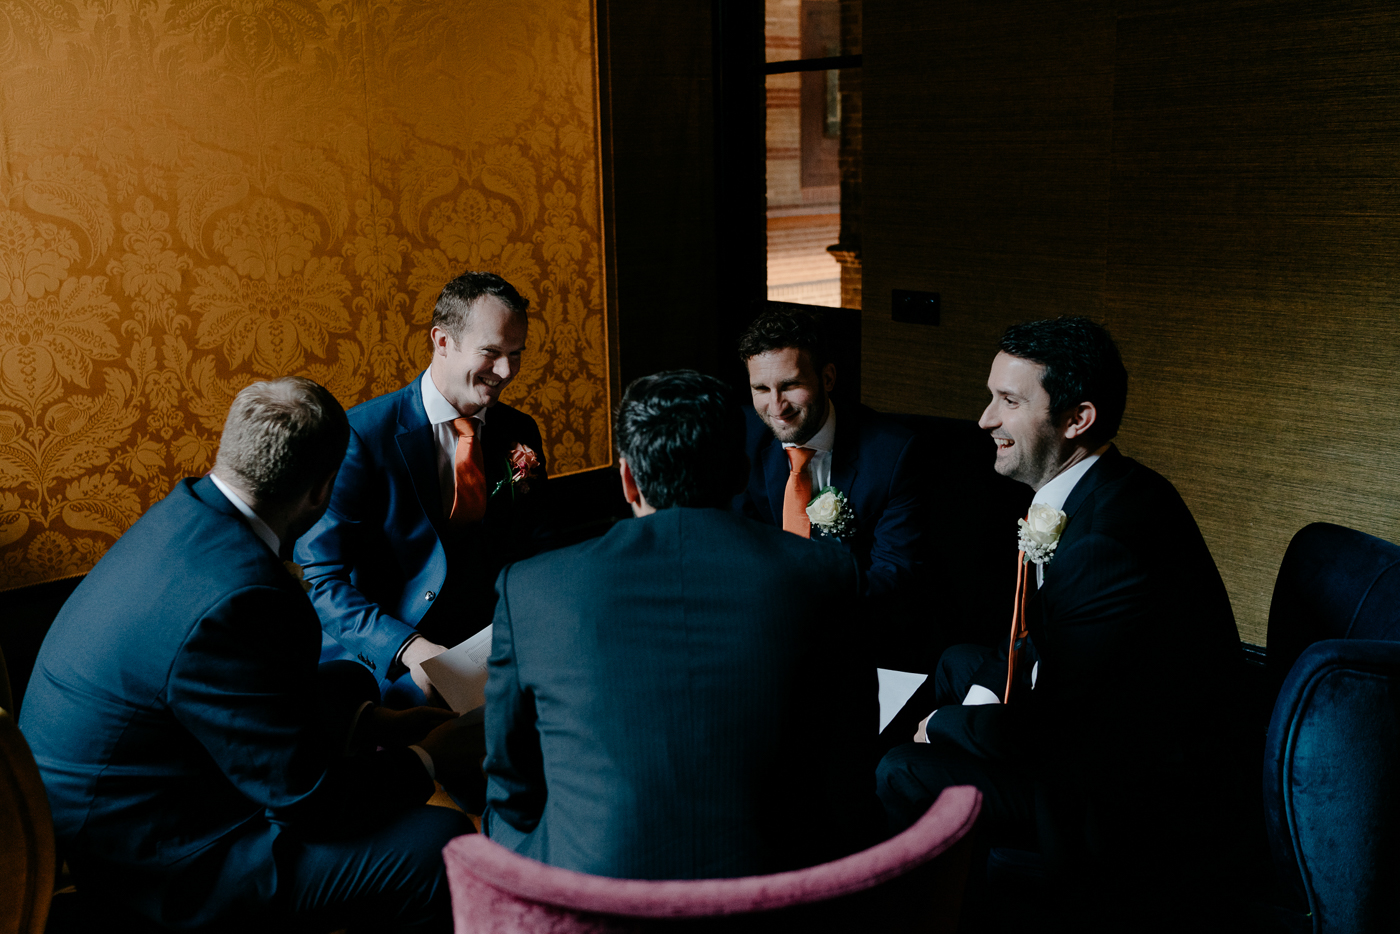 bruidsfotografie-trouwfotograaf-wedding-photographer-amsterdam-James-Jantine-004.jpg